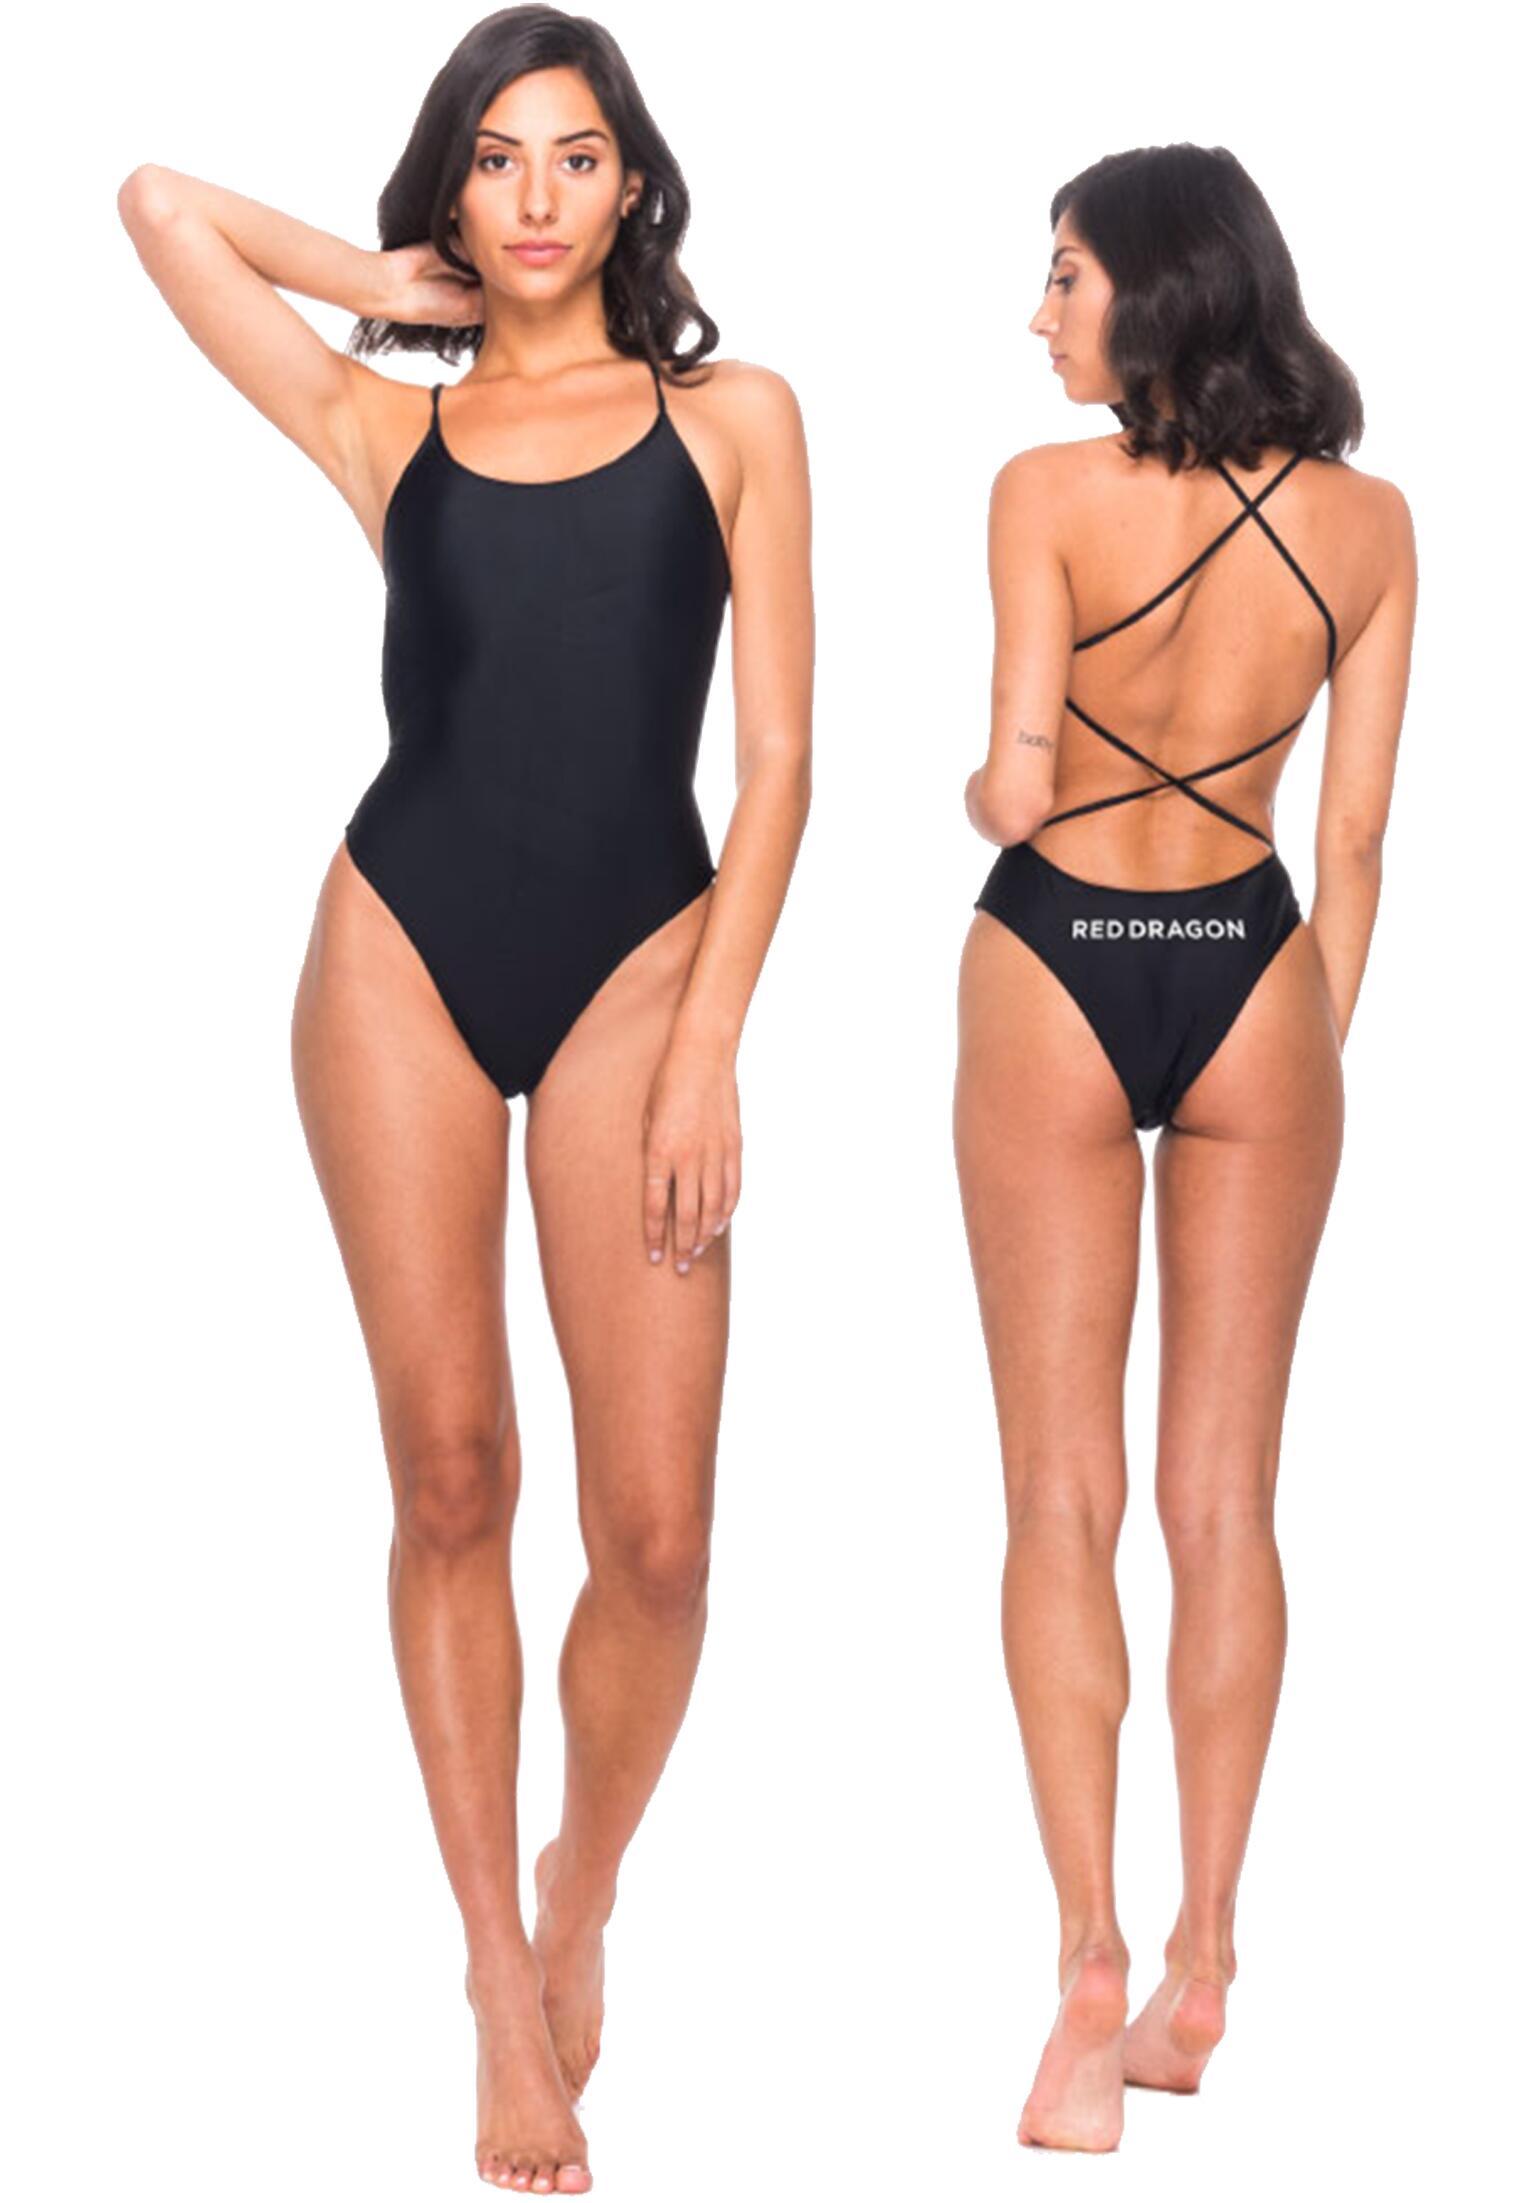 11bca82c09f1a Buy Bikinis & Beachwear for women in the Titus Onlineshop | Titus